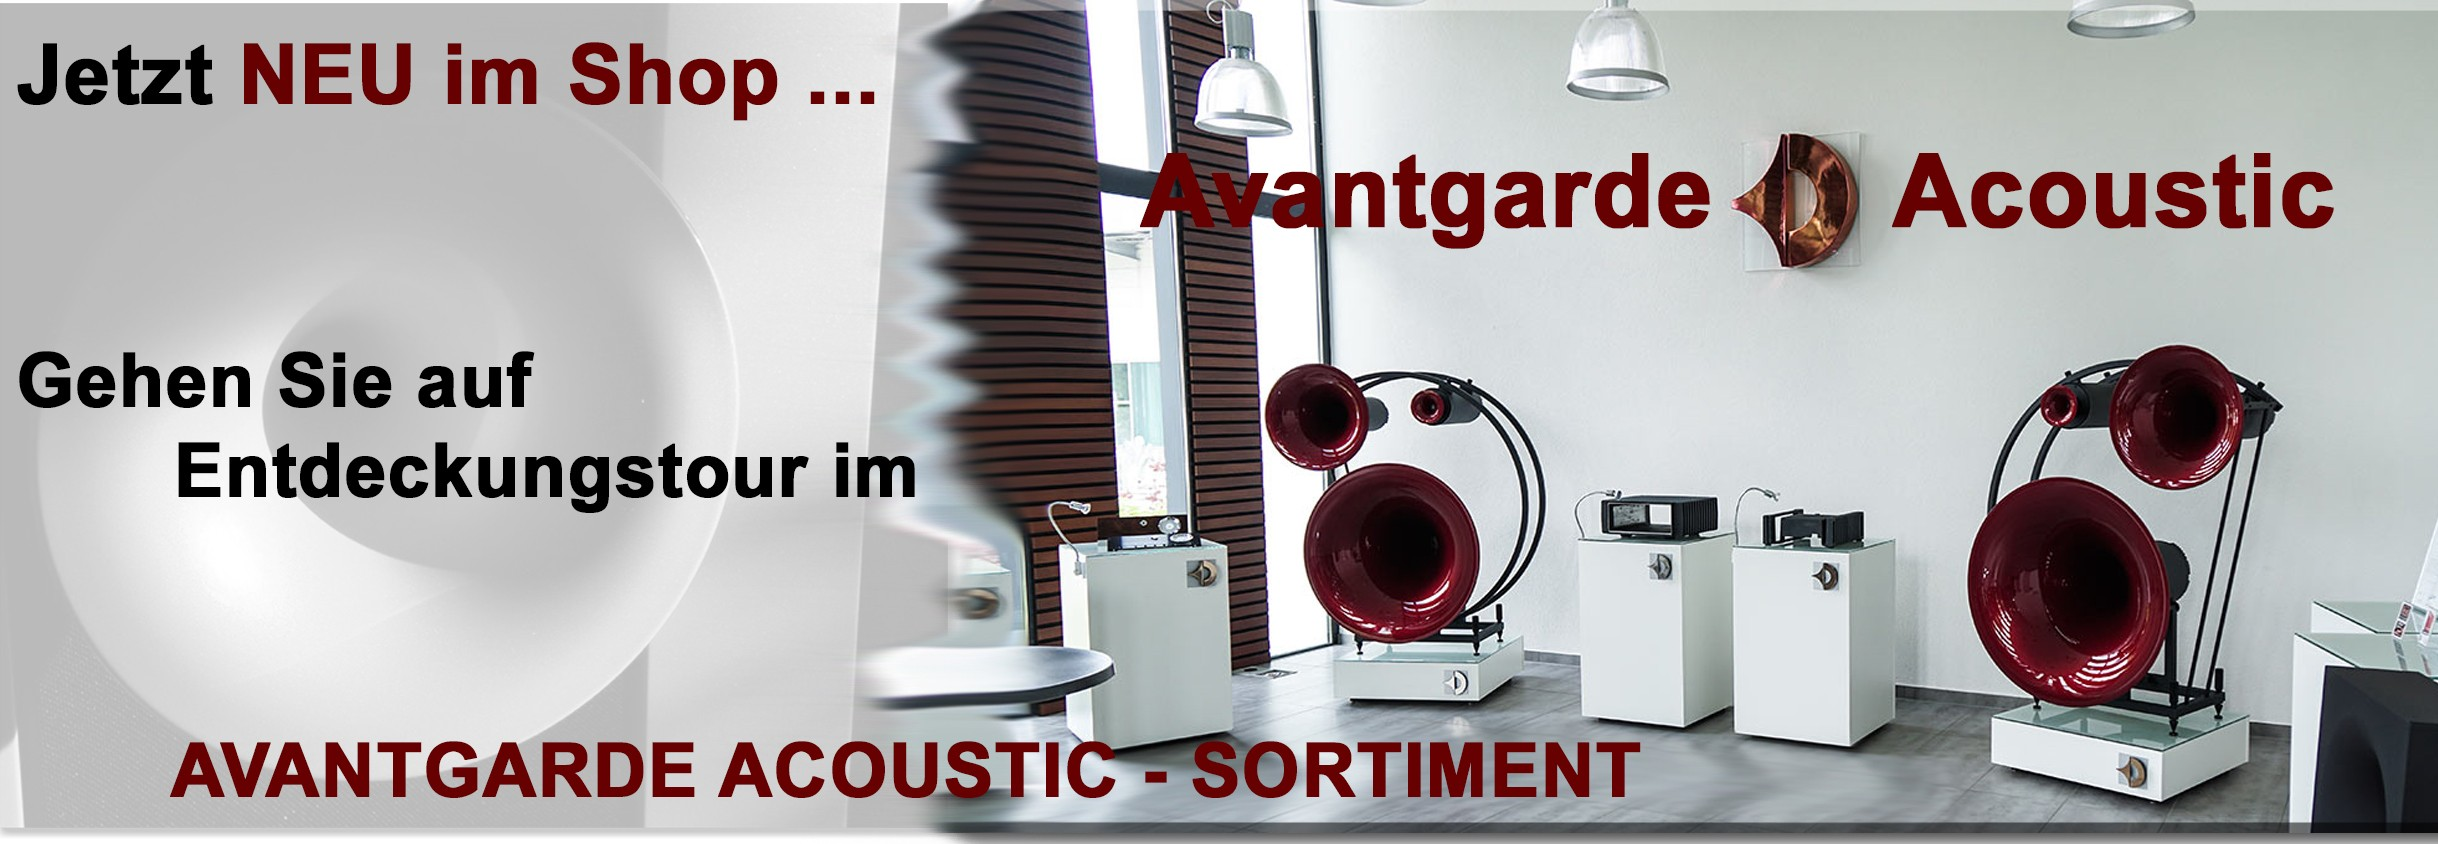 Avantgarde Acoustic